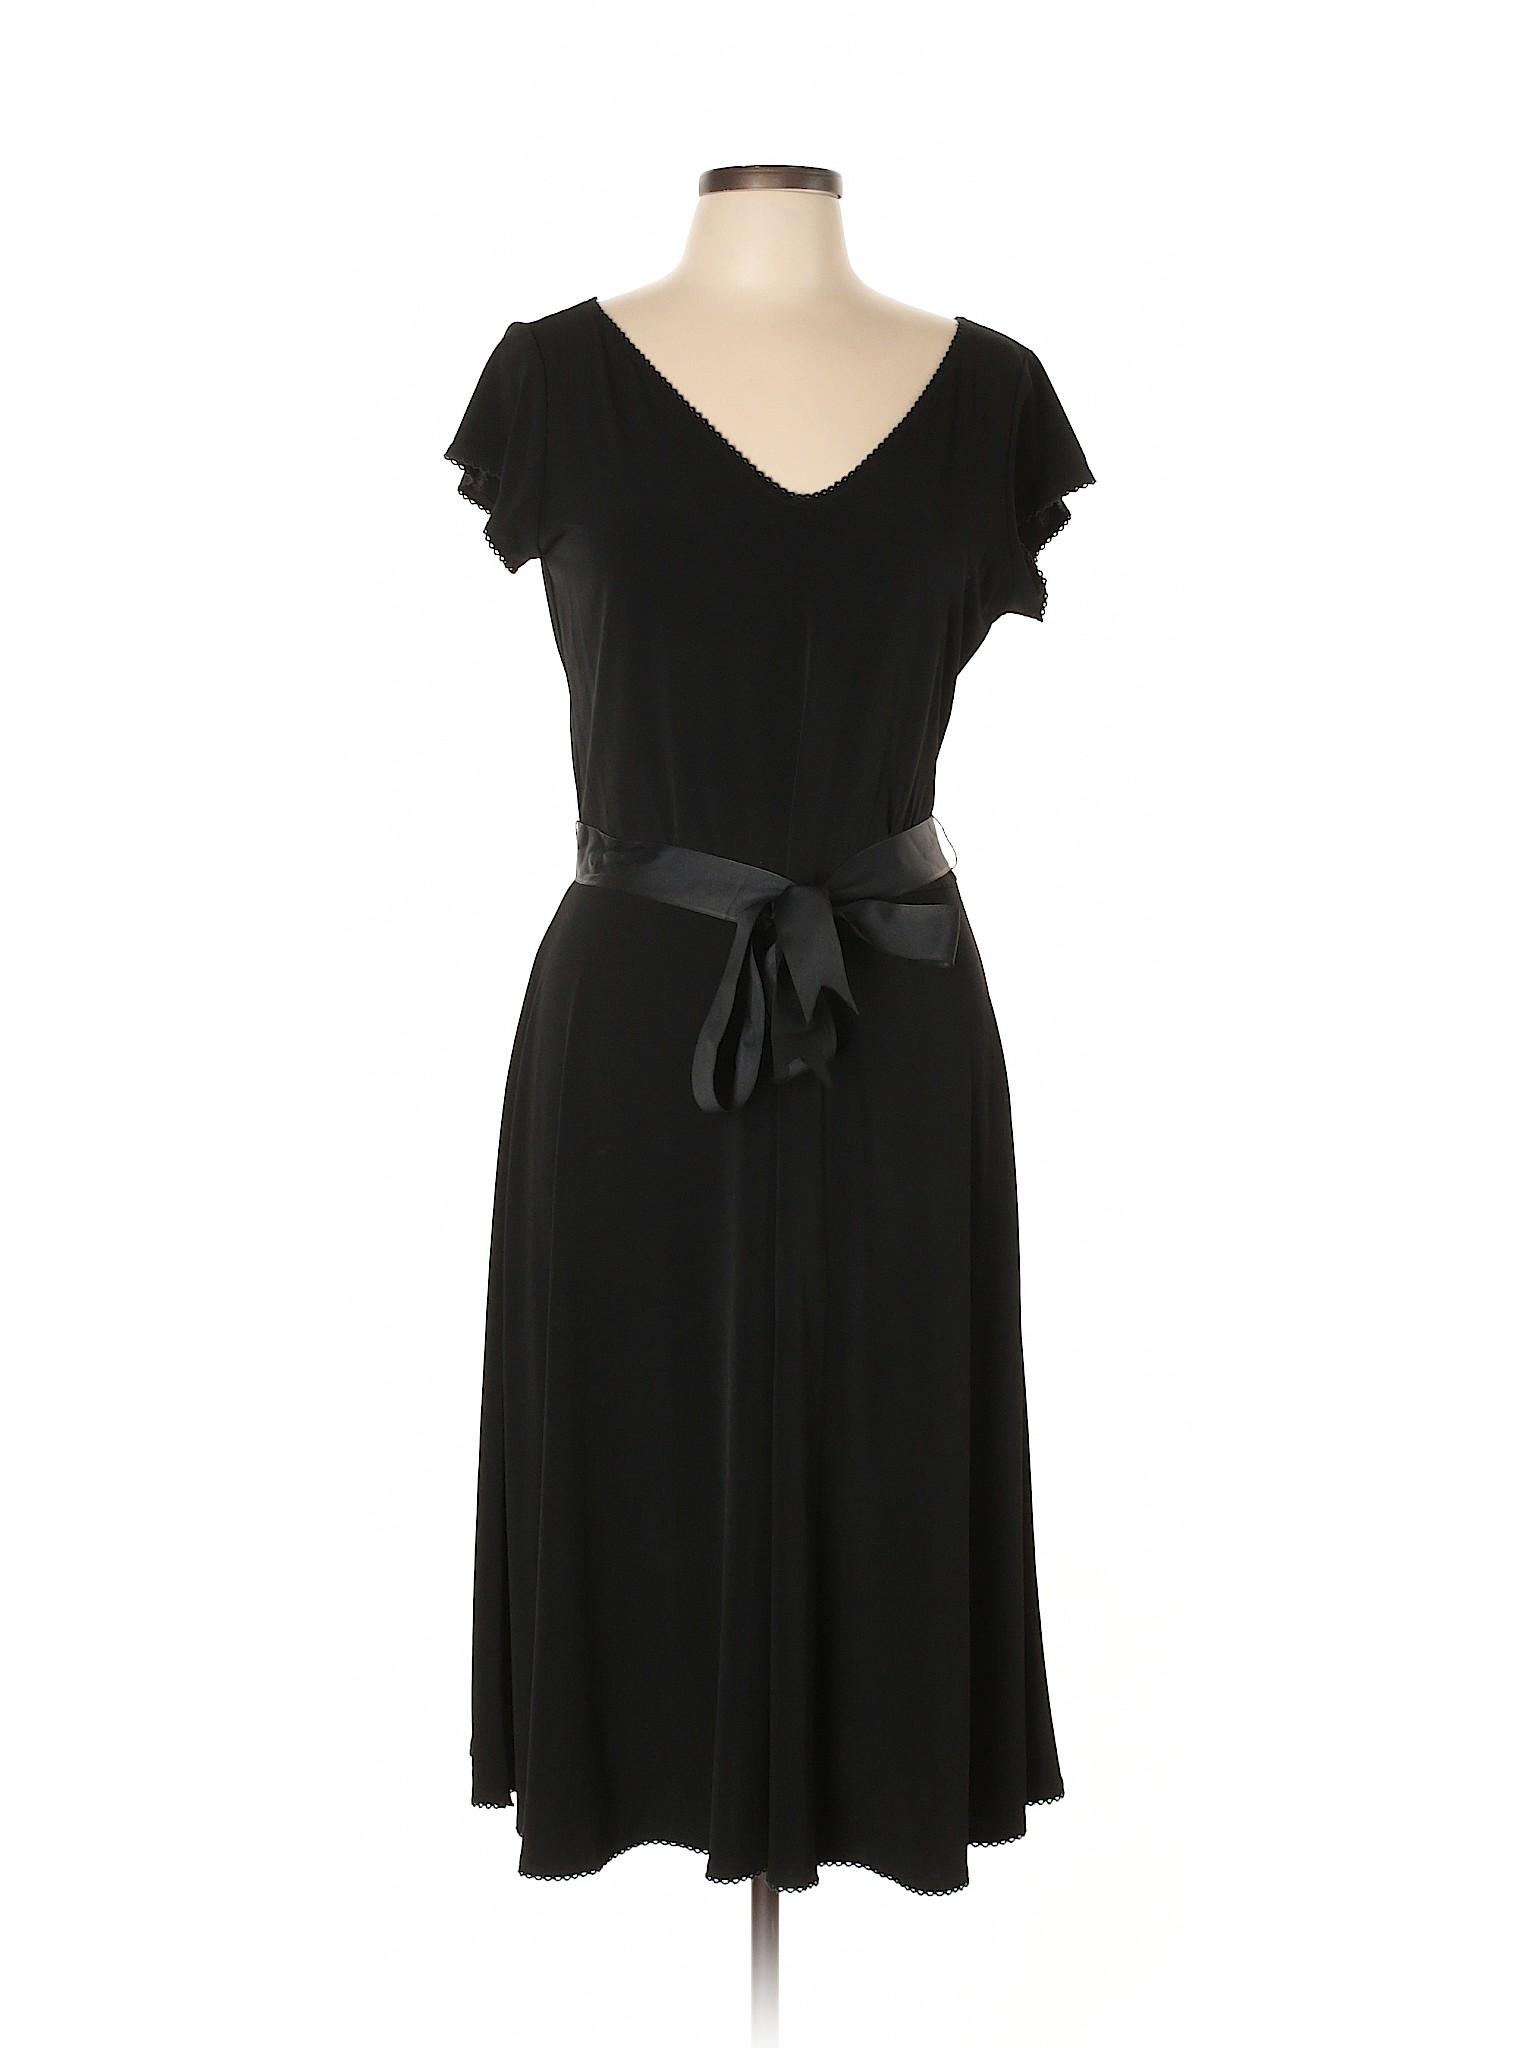 Dress Moda International Boutique winter Casual x04q80Cg1n